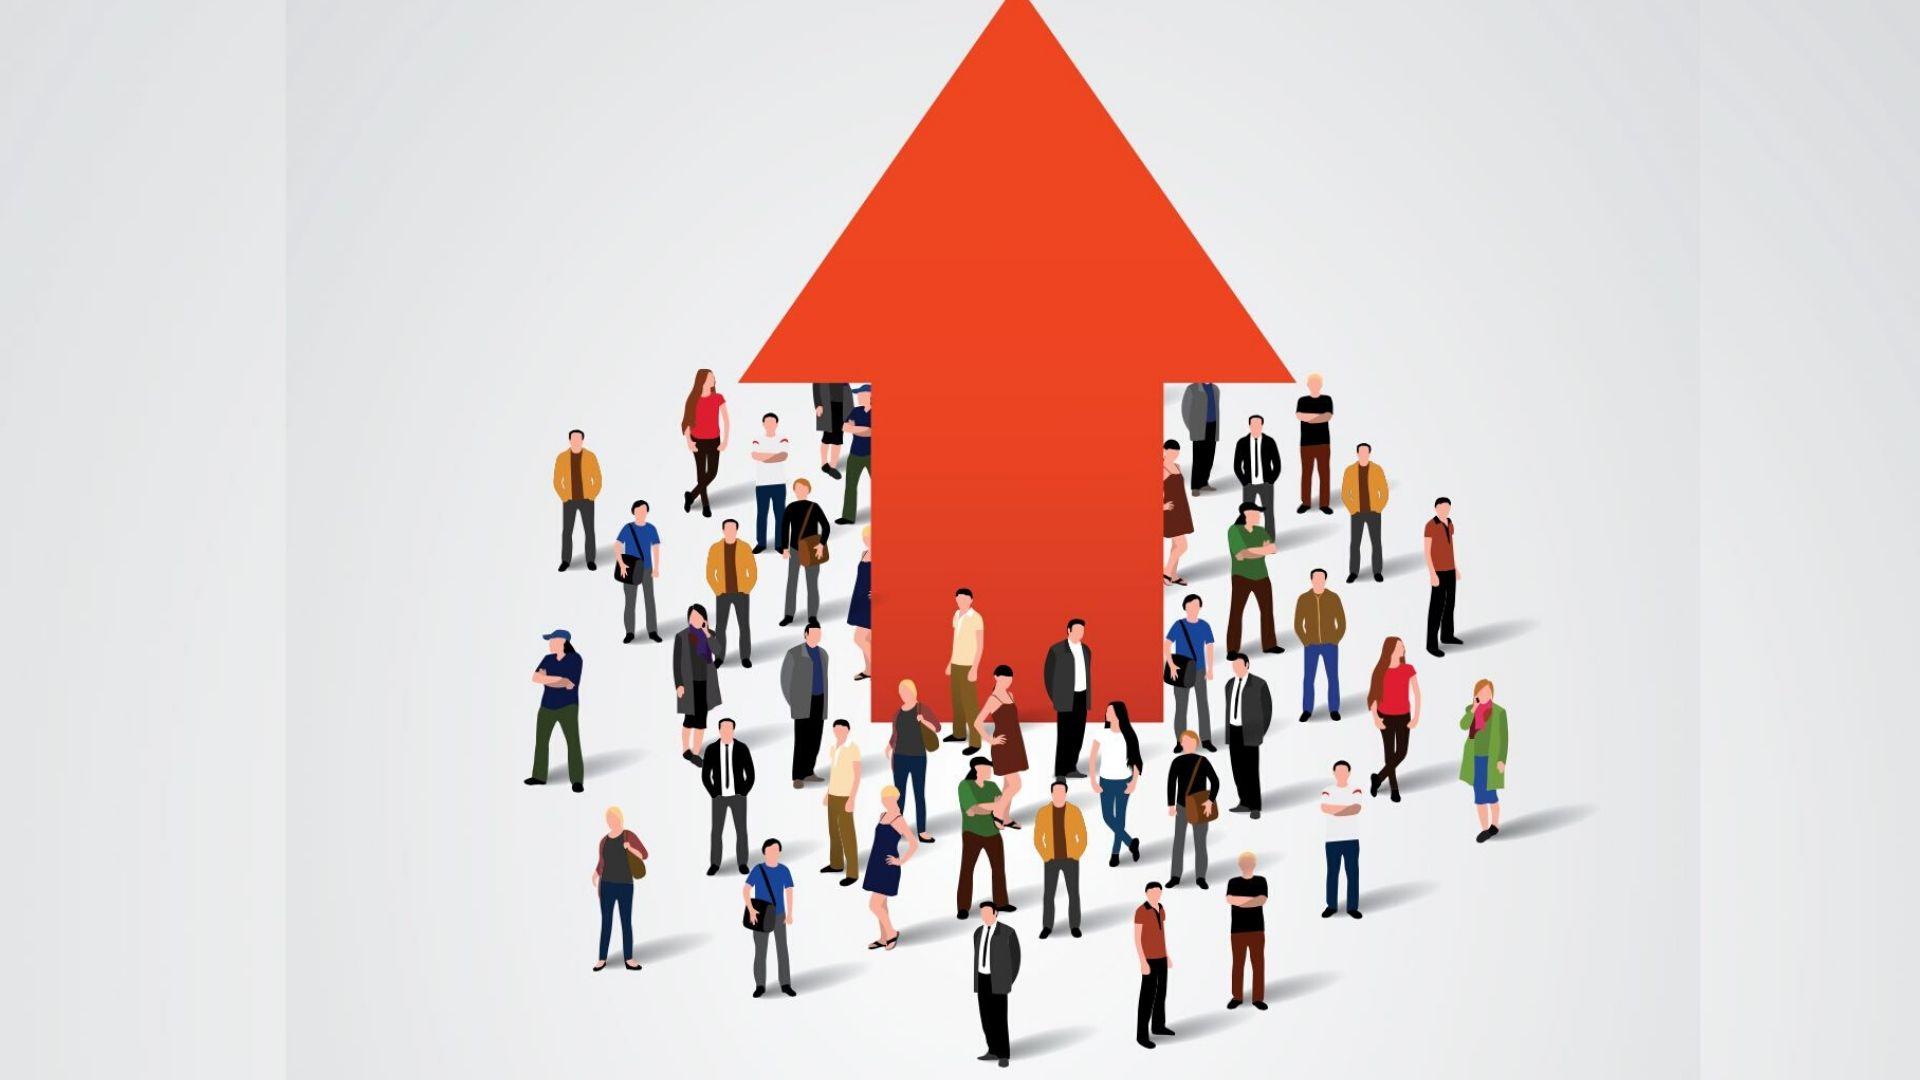 EPRC : რეკომენდაციები მთავრობას ჯადაცვის მიმართულებით • ForbesWoman